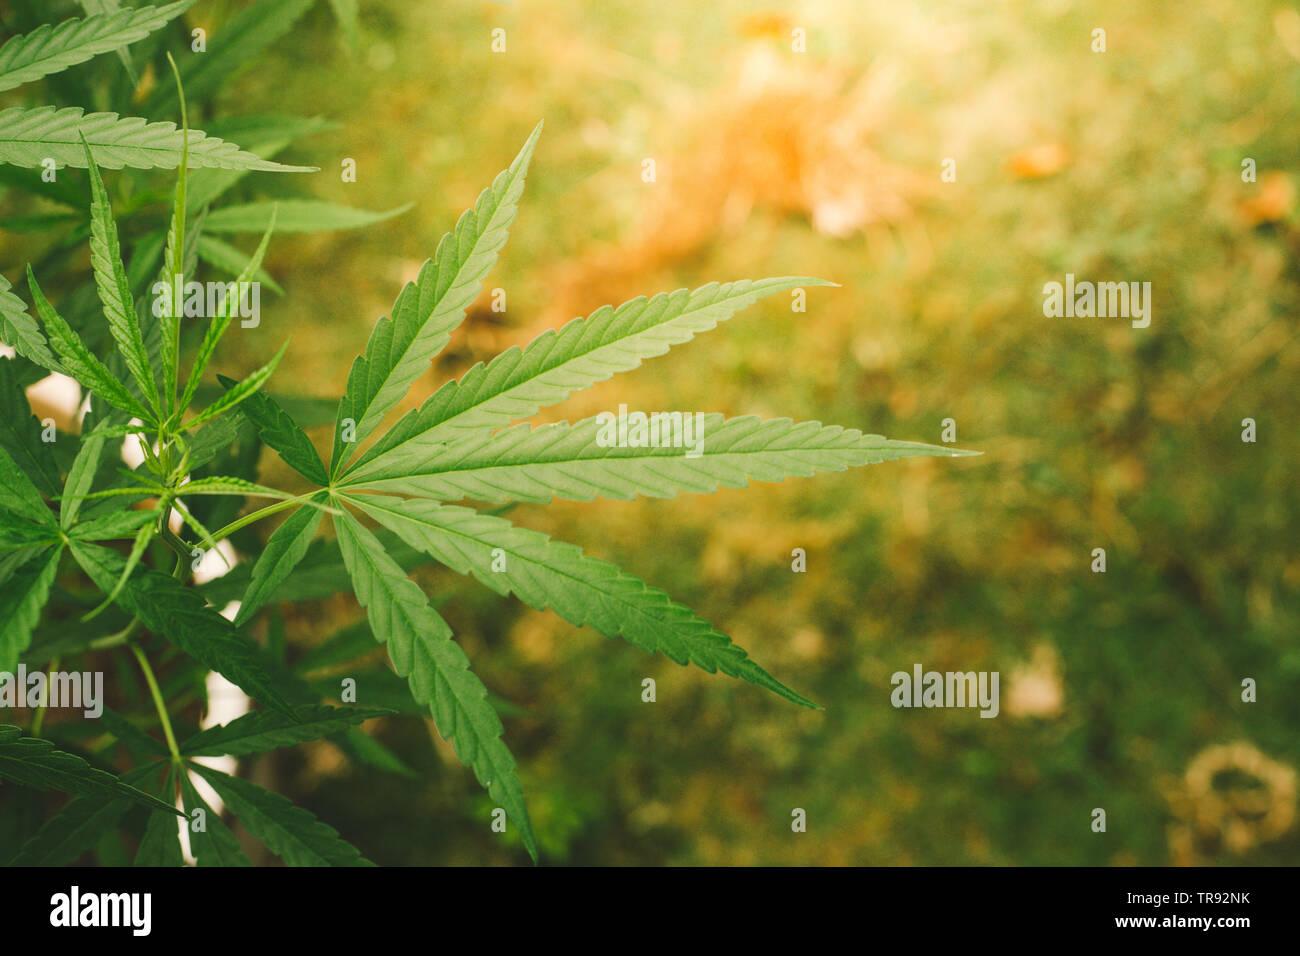 Feuilles de marijuana.Close up de feuilles de cannabis dans le jardin Banque D'Images